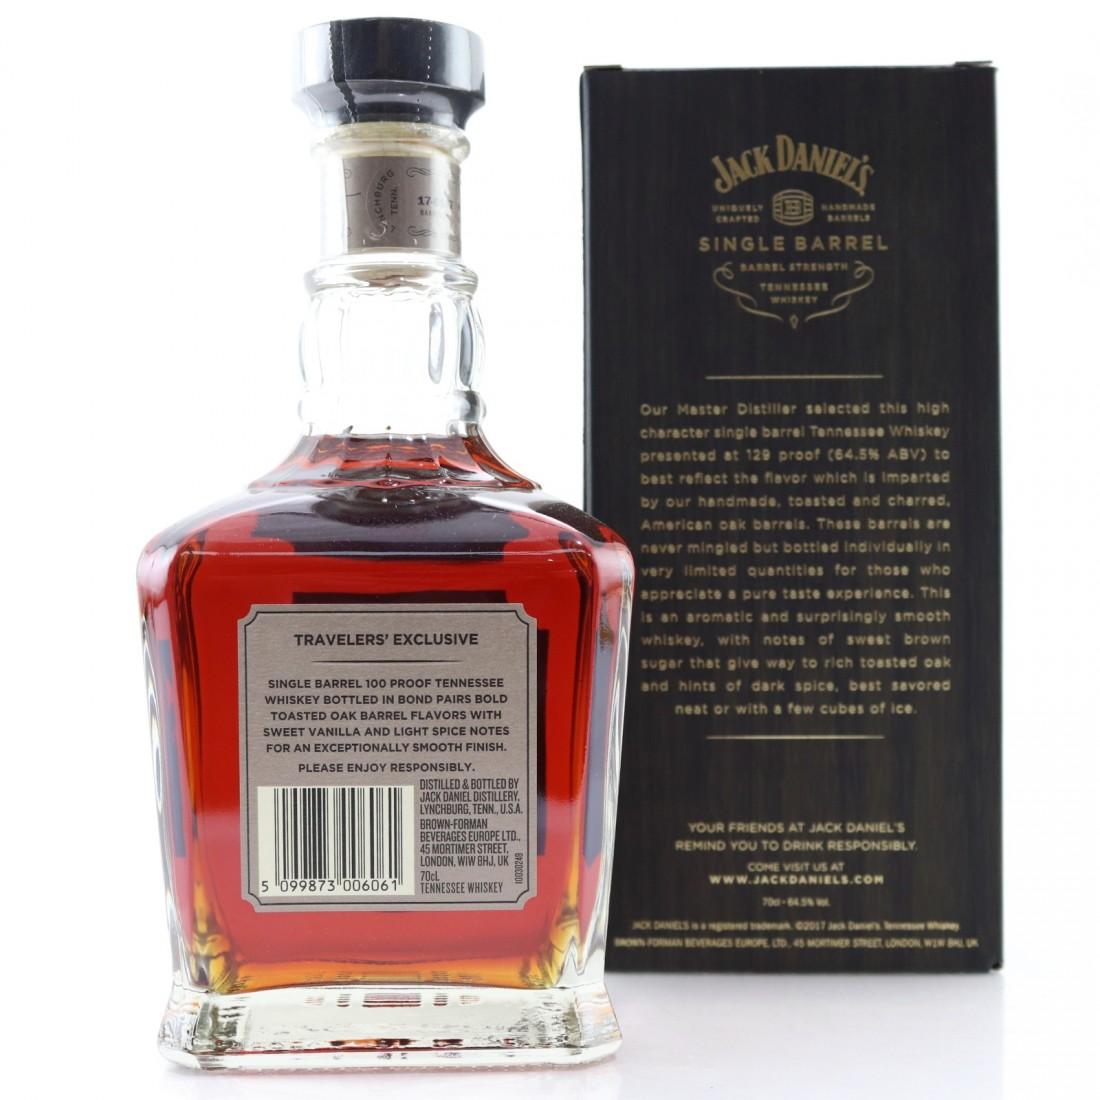 Jack Daniel's Single Barrel 100 Proof